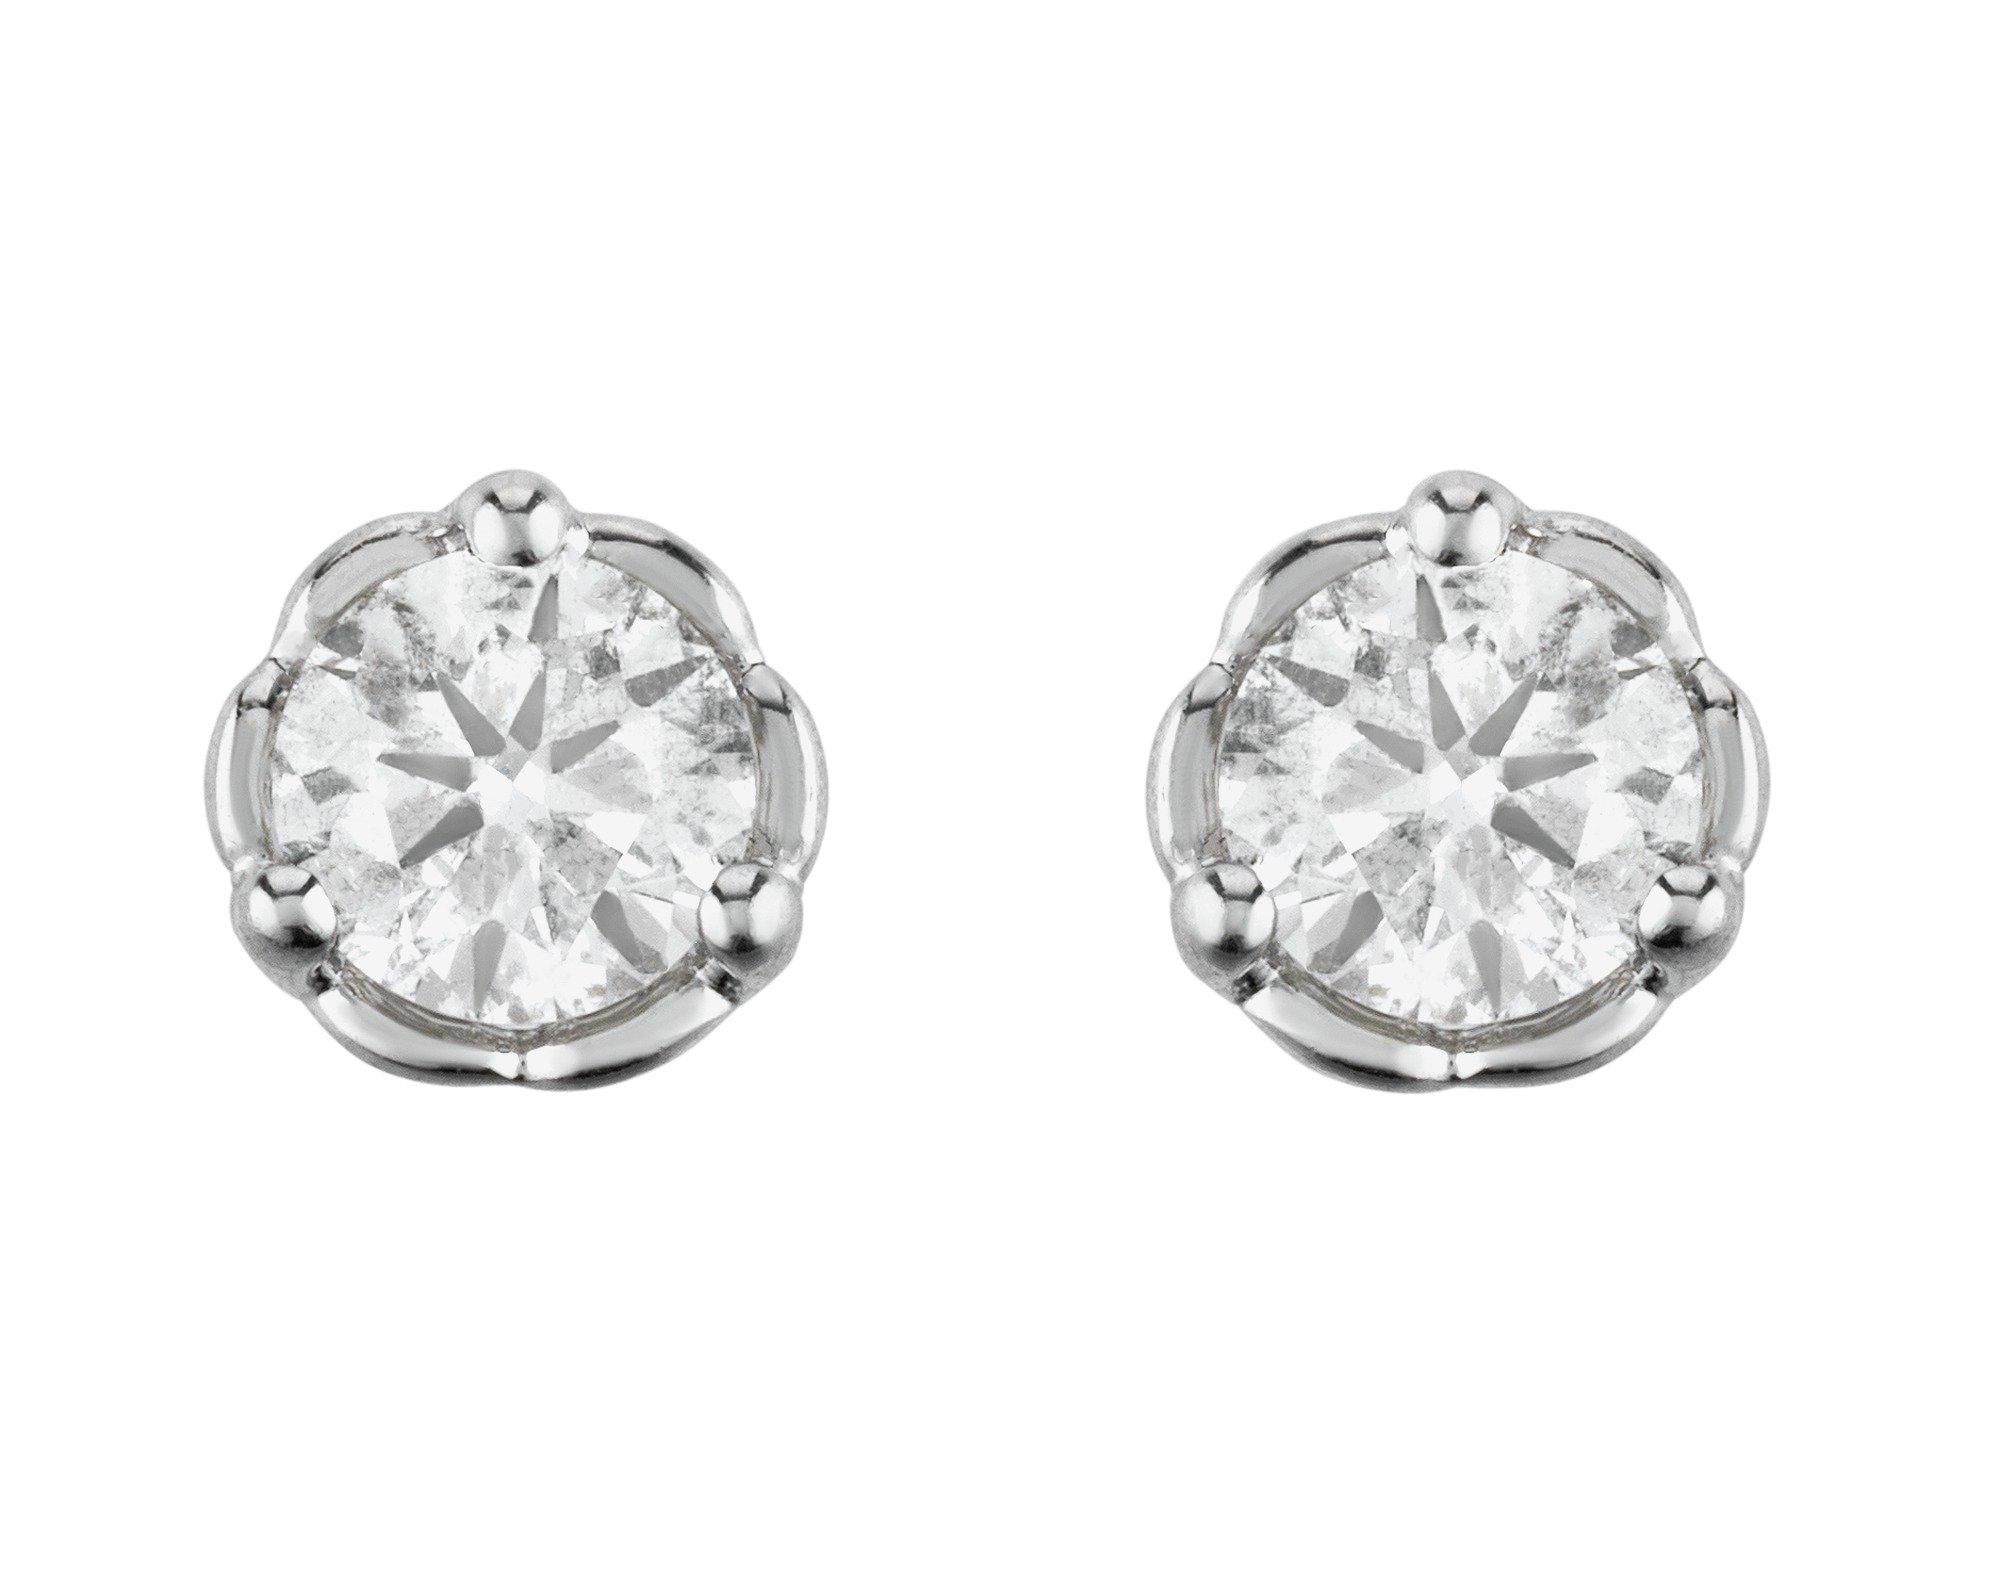 Image of Enchanted - 9 Carat White Gold - 0.50 Carat two Diamond Earrings.